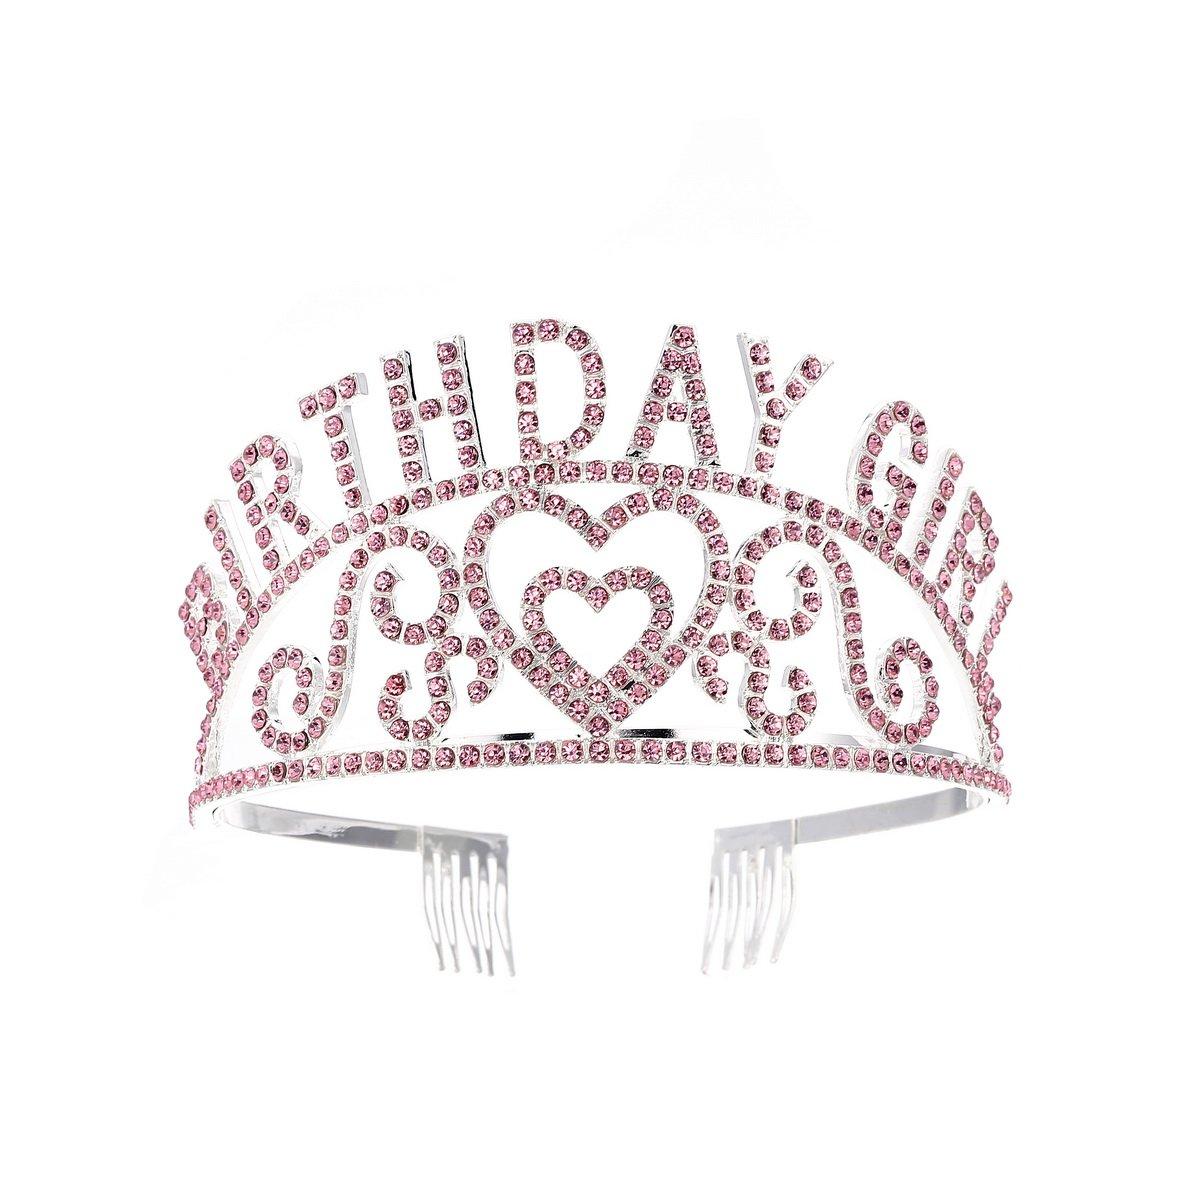 FF Pink Rhinestones Birthday Girl Tiara Crown for Prom